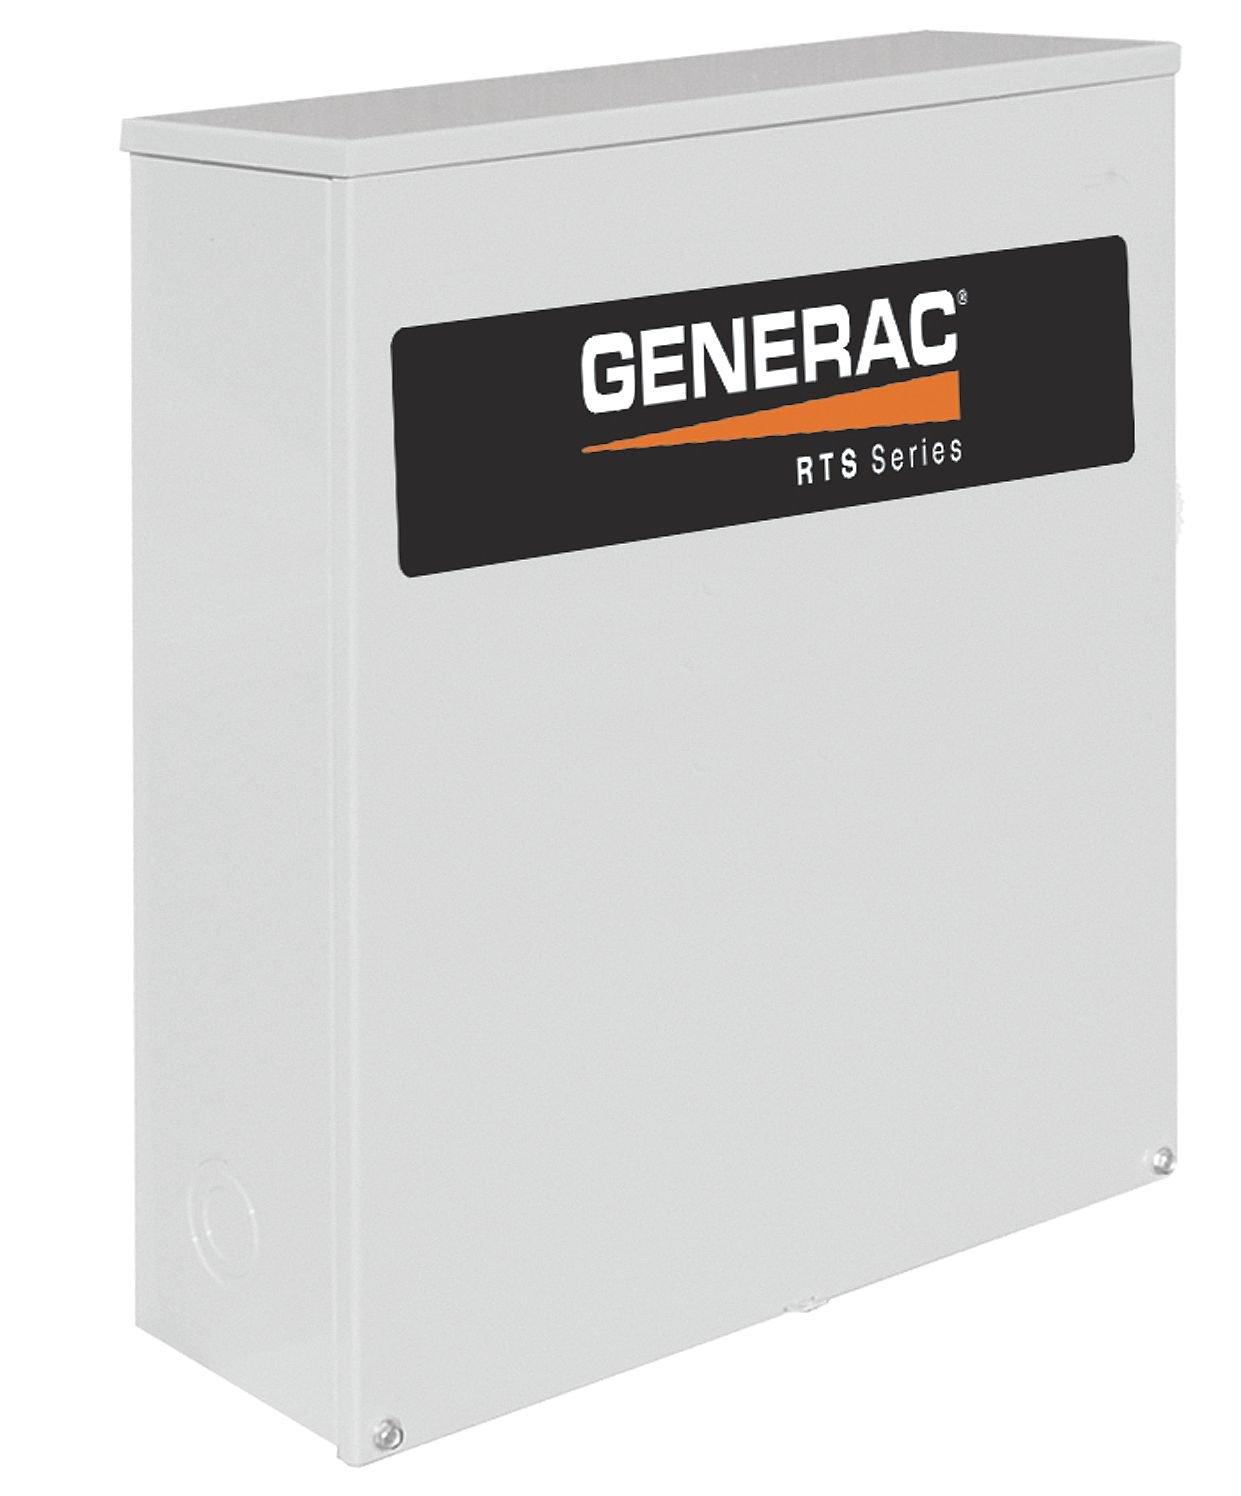 Generac RTSN200J3 Generator Transfer Switch 200-Amp 120/240 3 NEMA 3R CUL (Discontinued by Manufacturer)